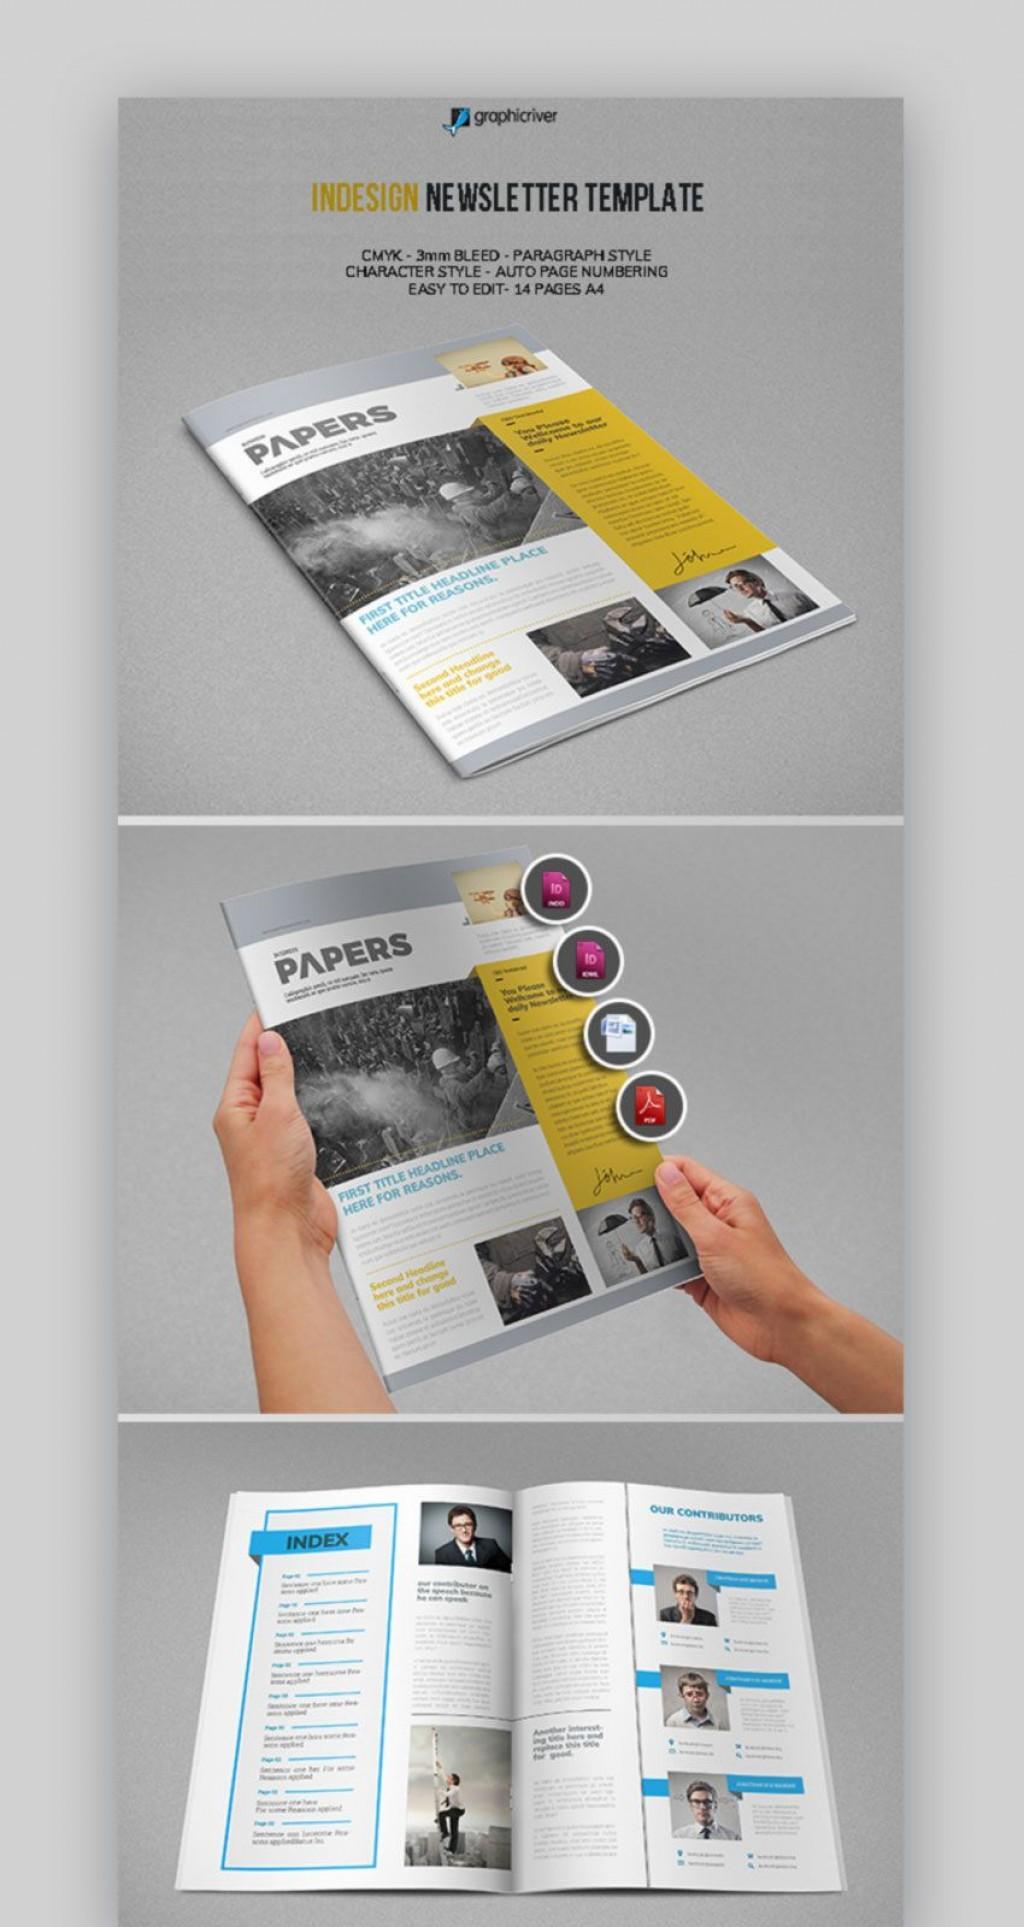 009 Beautiful Microsoft Publisher Newsletter Template Design  School Free DownloadLarge